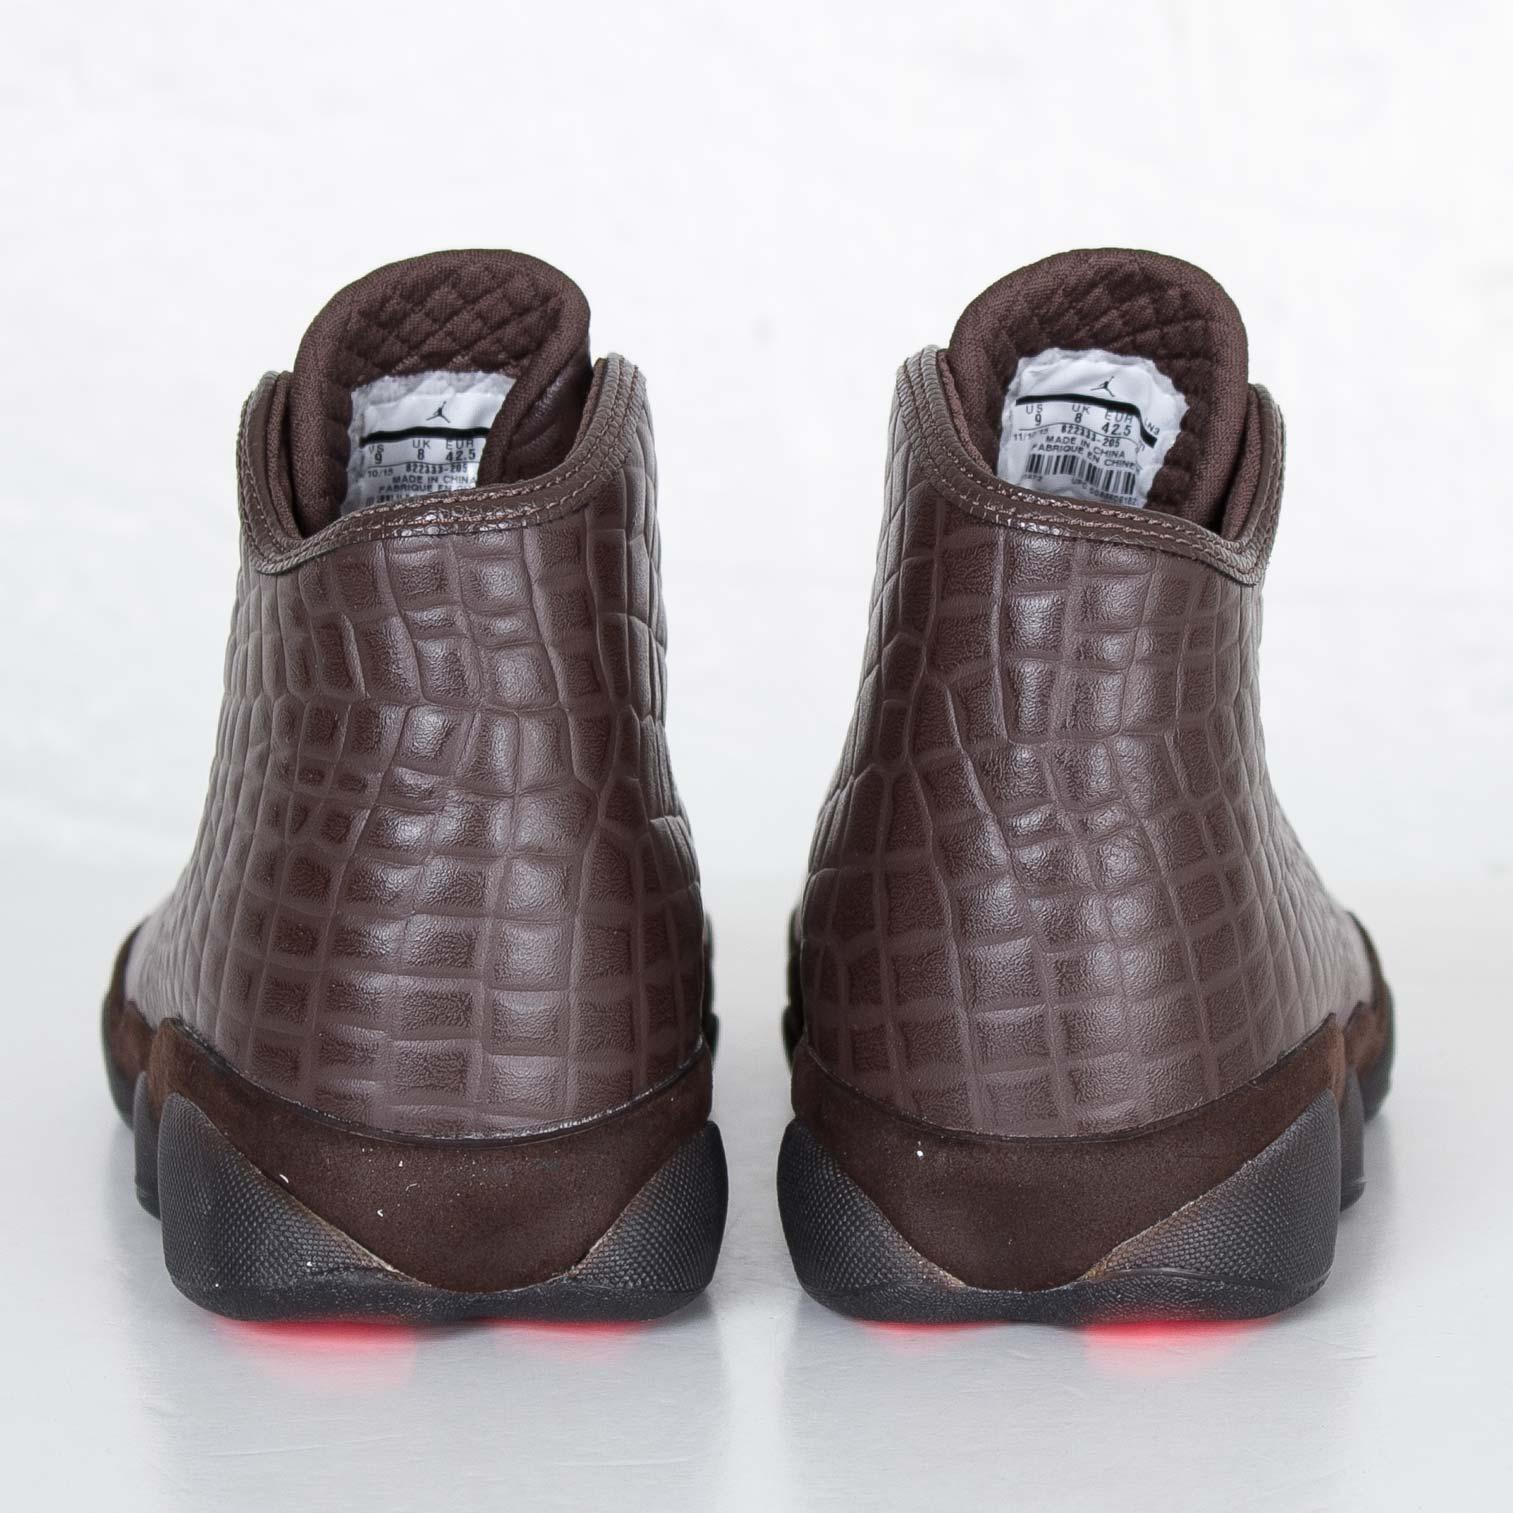 1de78fdb546 Jordan Brand Jordan Horizon Premium - 822333-205 - Sneakersnstuff | sneakers  & streetwear online since 1999